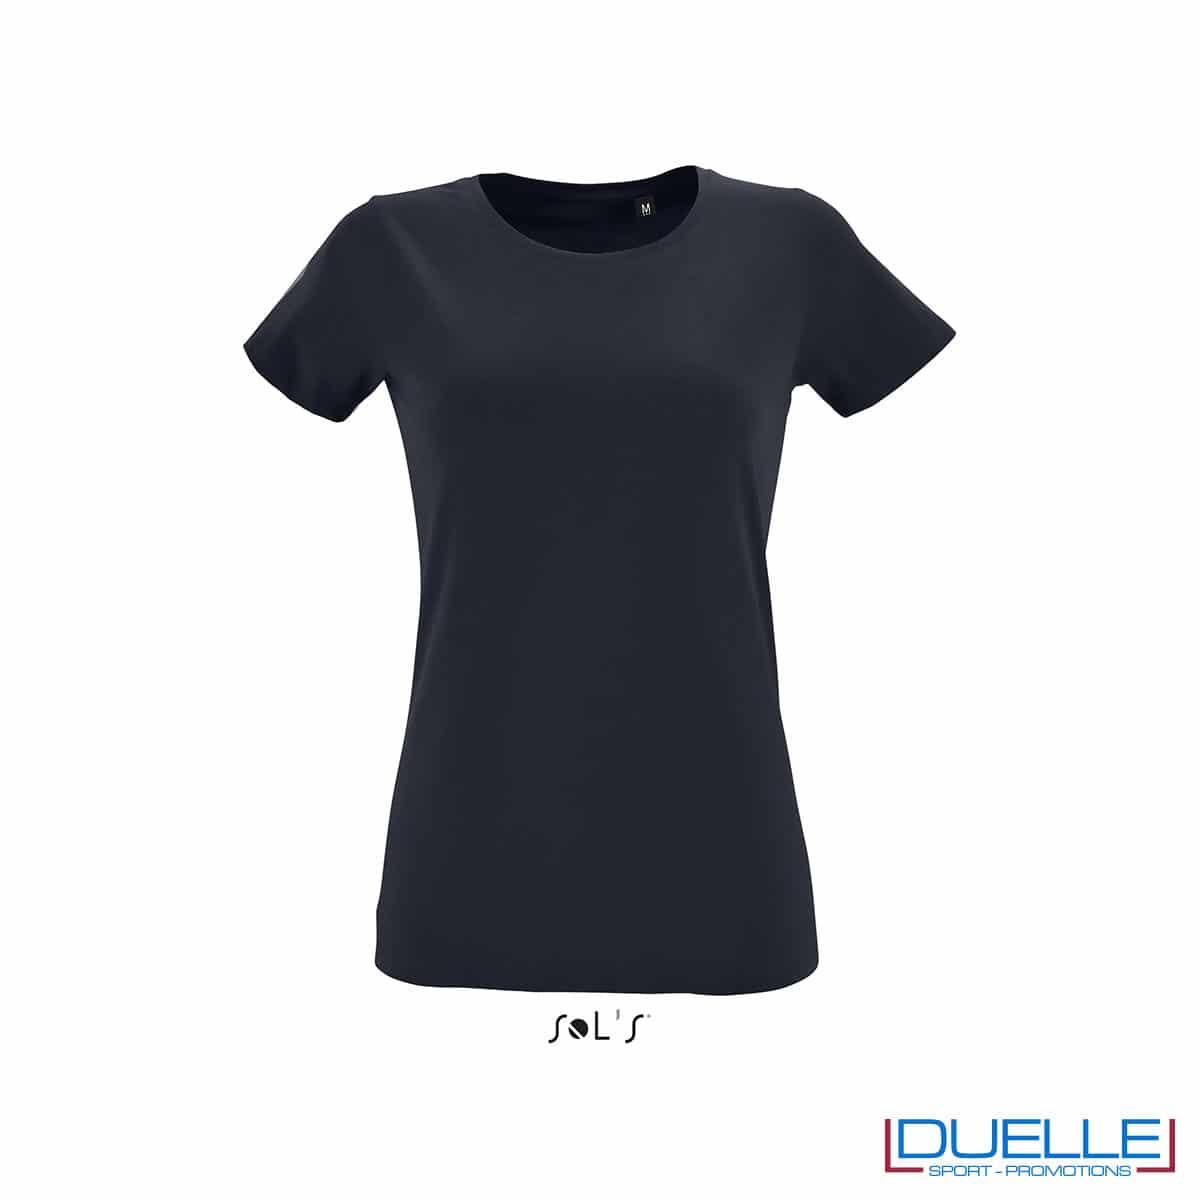 maglietta donna blu oltremare slim fit